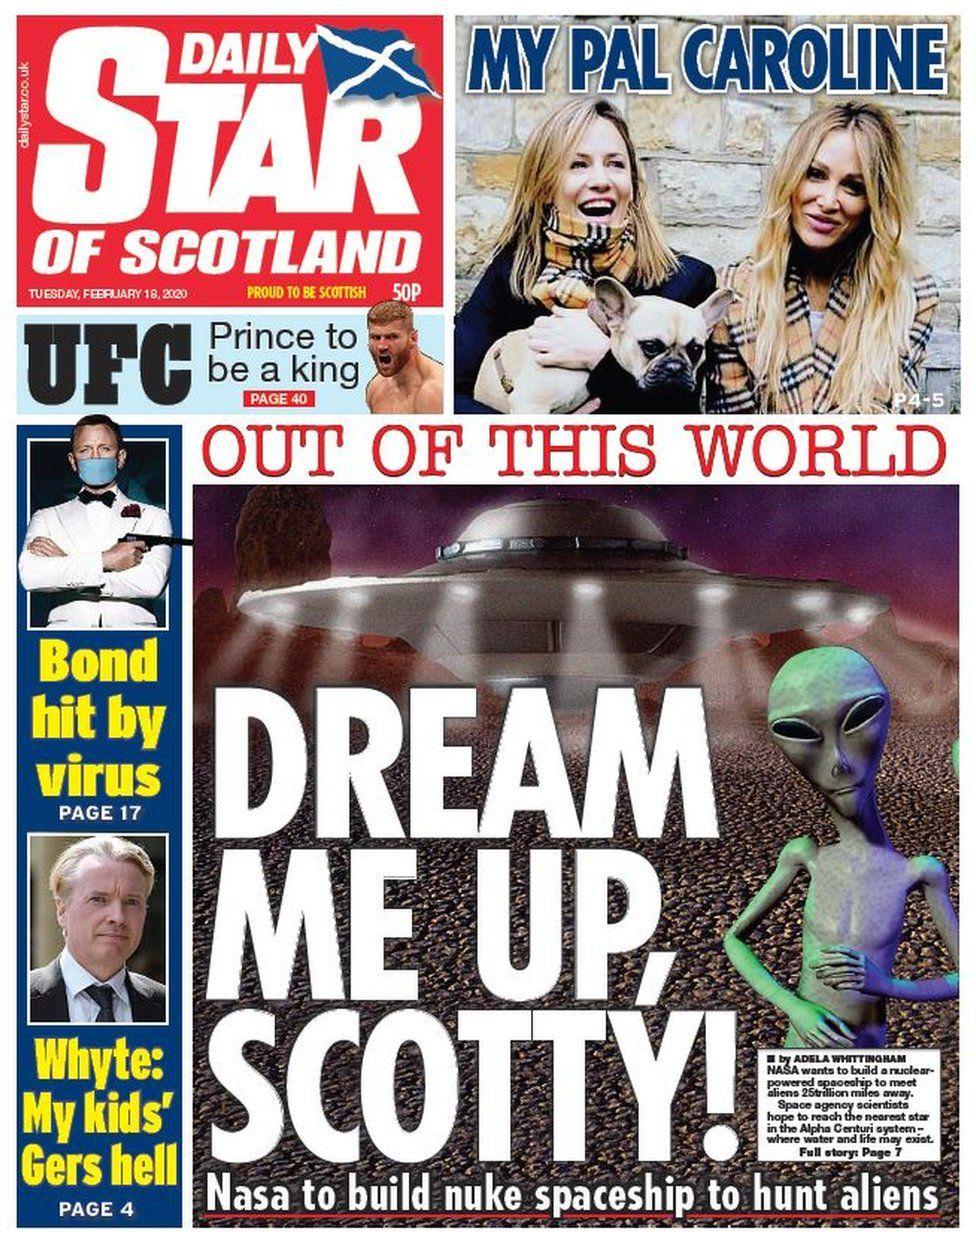 Daily Star of Scotland